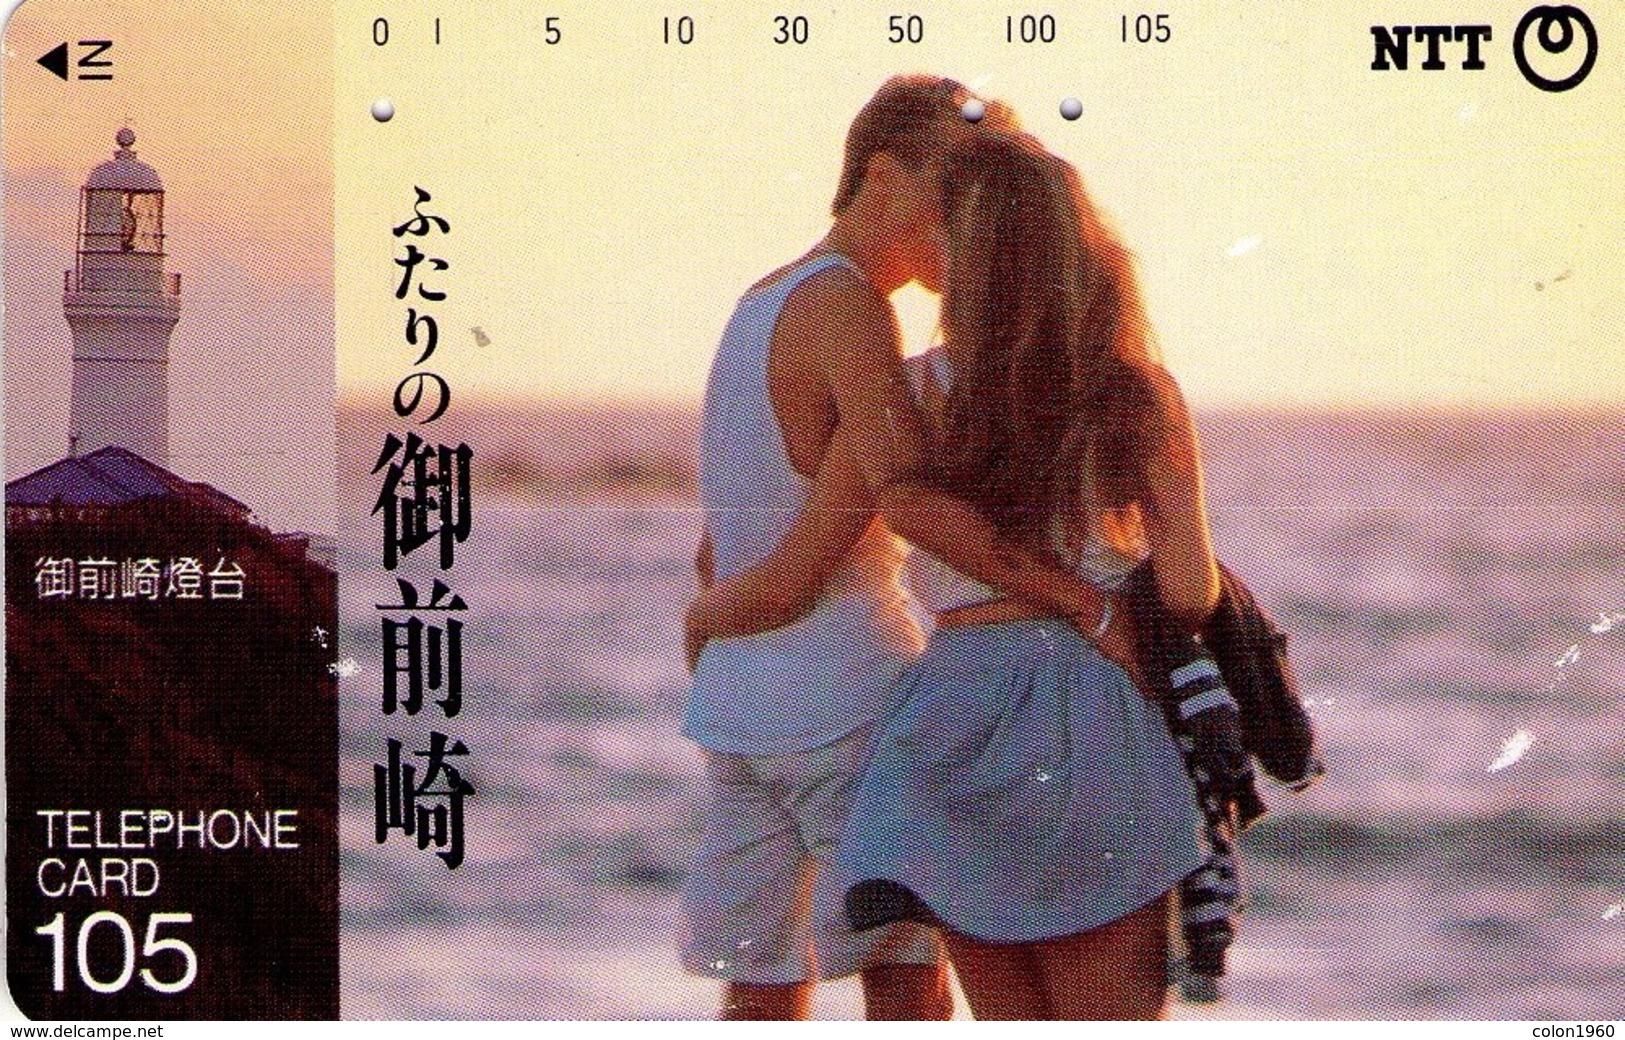 TARJETA TELEFONICA DE JAPON. (CHICAS) PAREJA Y FARO, 11/90, 290-528. (084) - Erótica (Adultos)